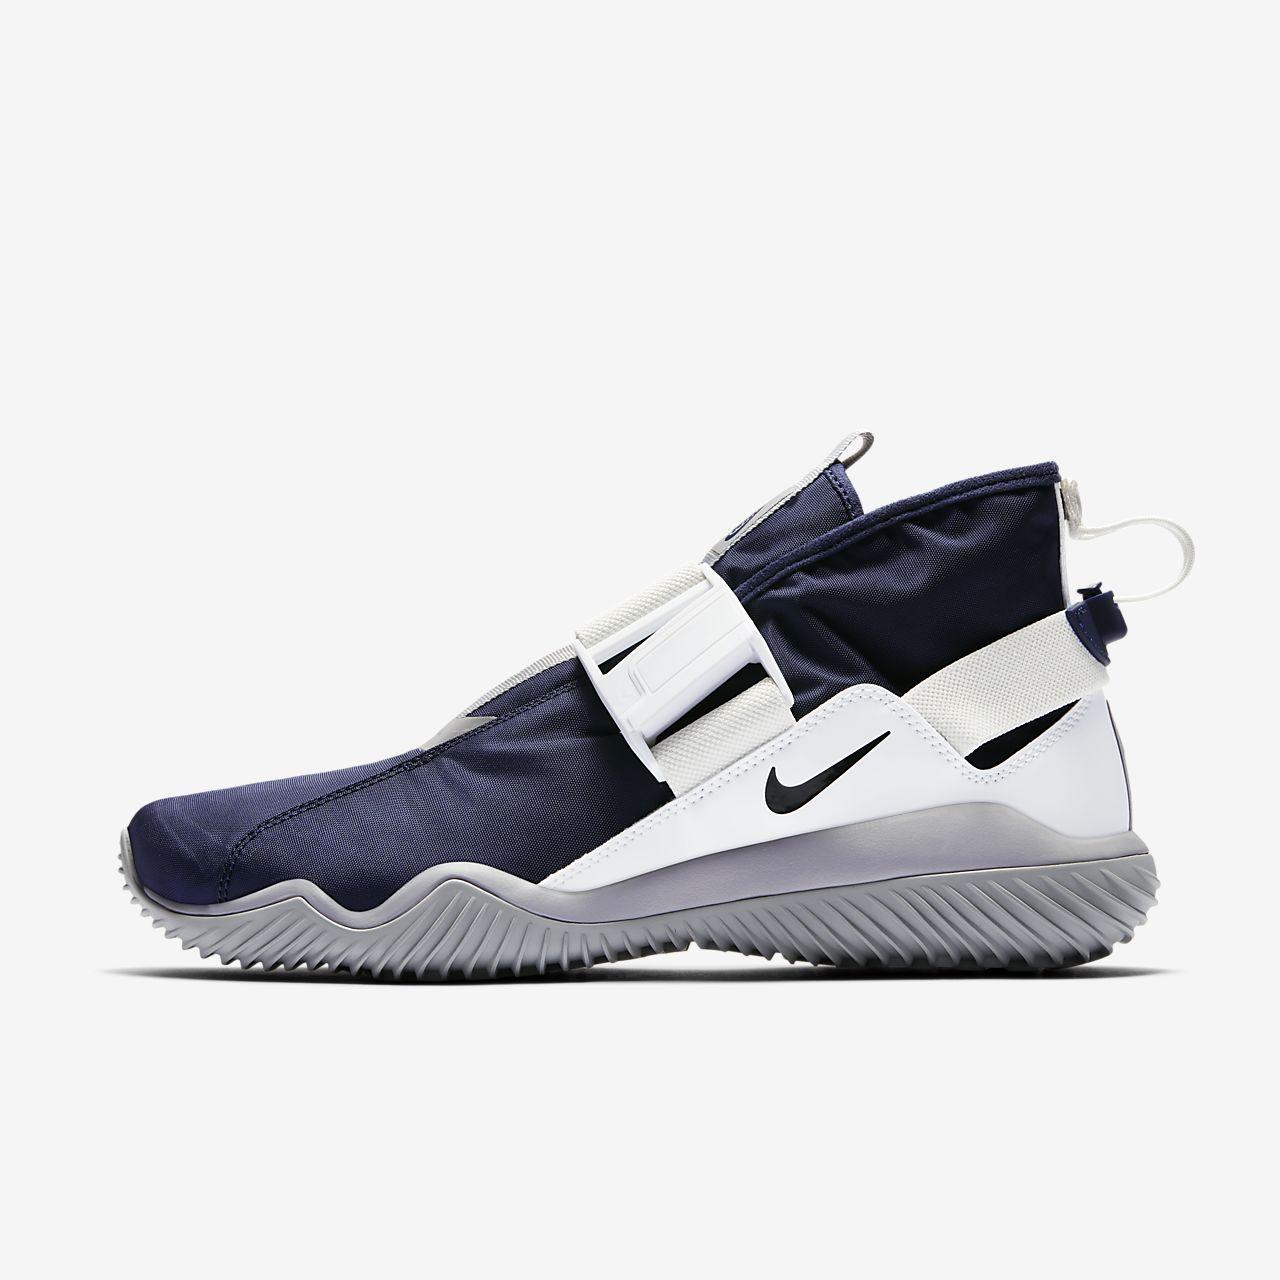 pretty nice 9cd0d 11195 ... Calzado para hombre Nike Komyuter